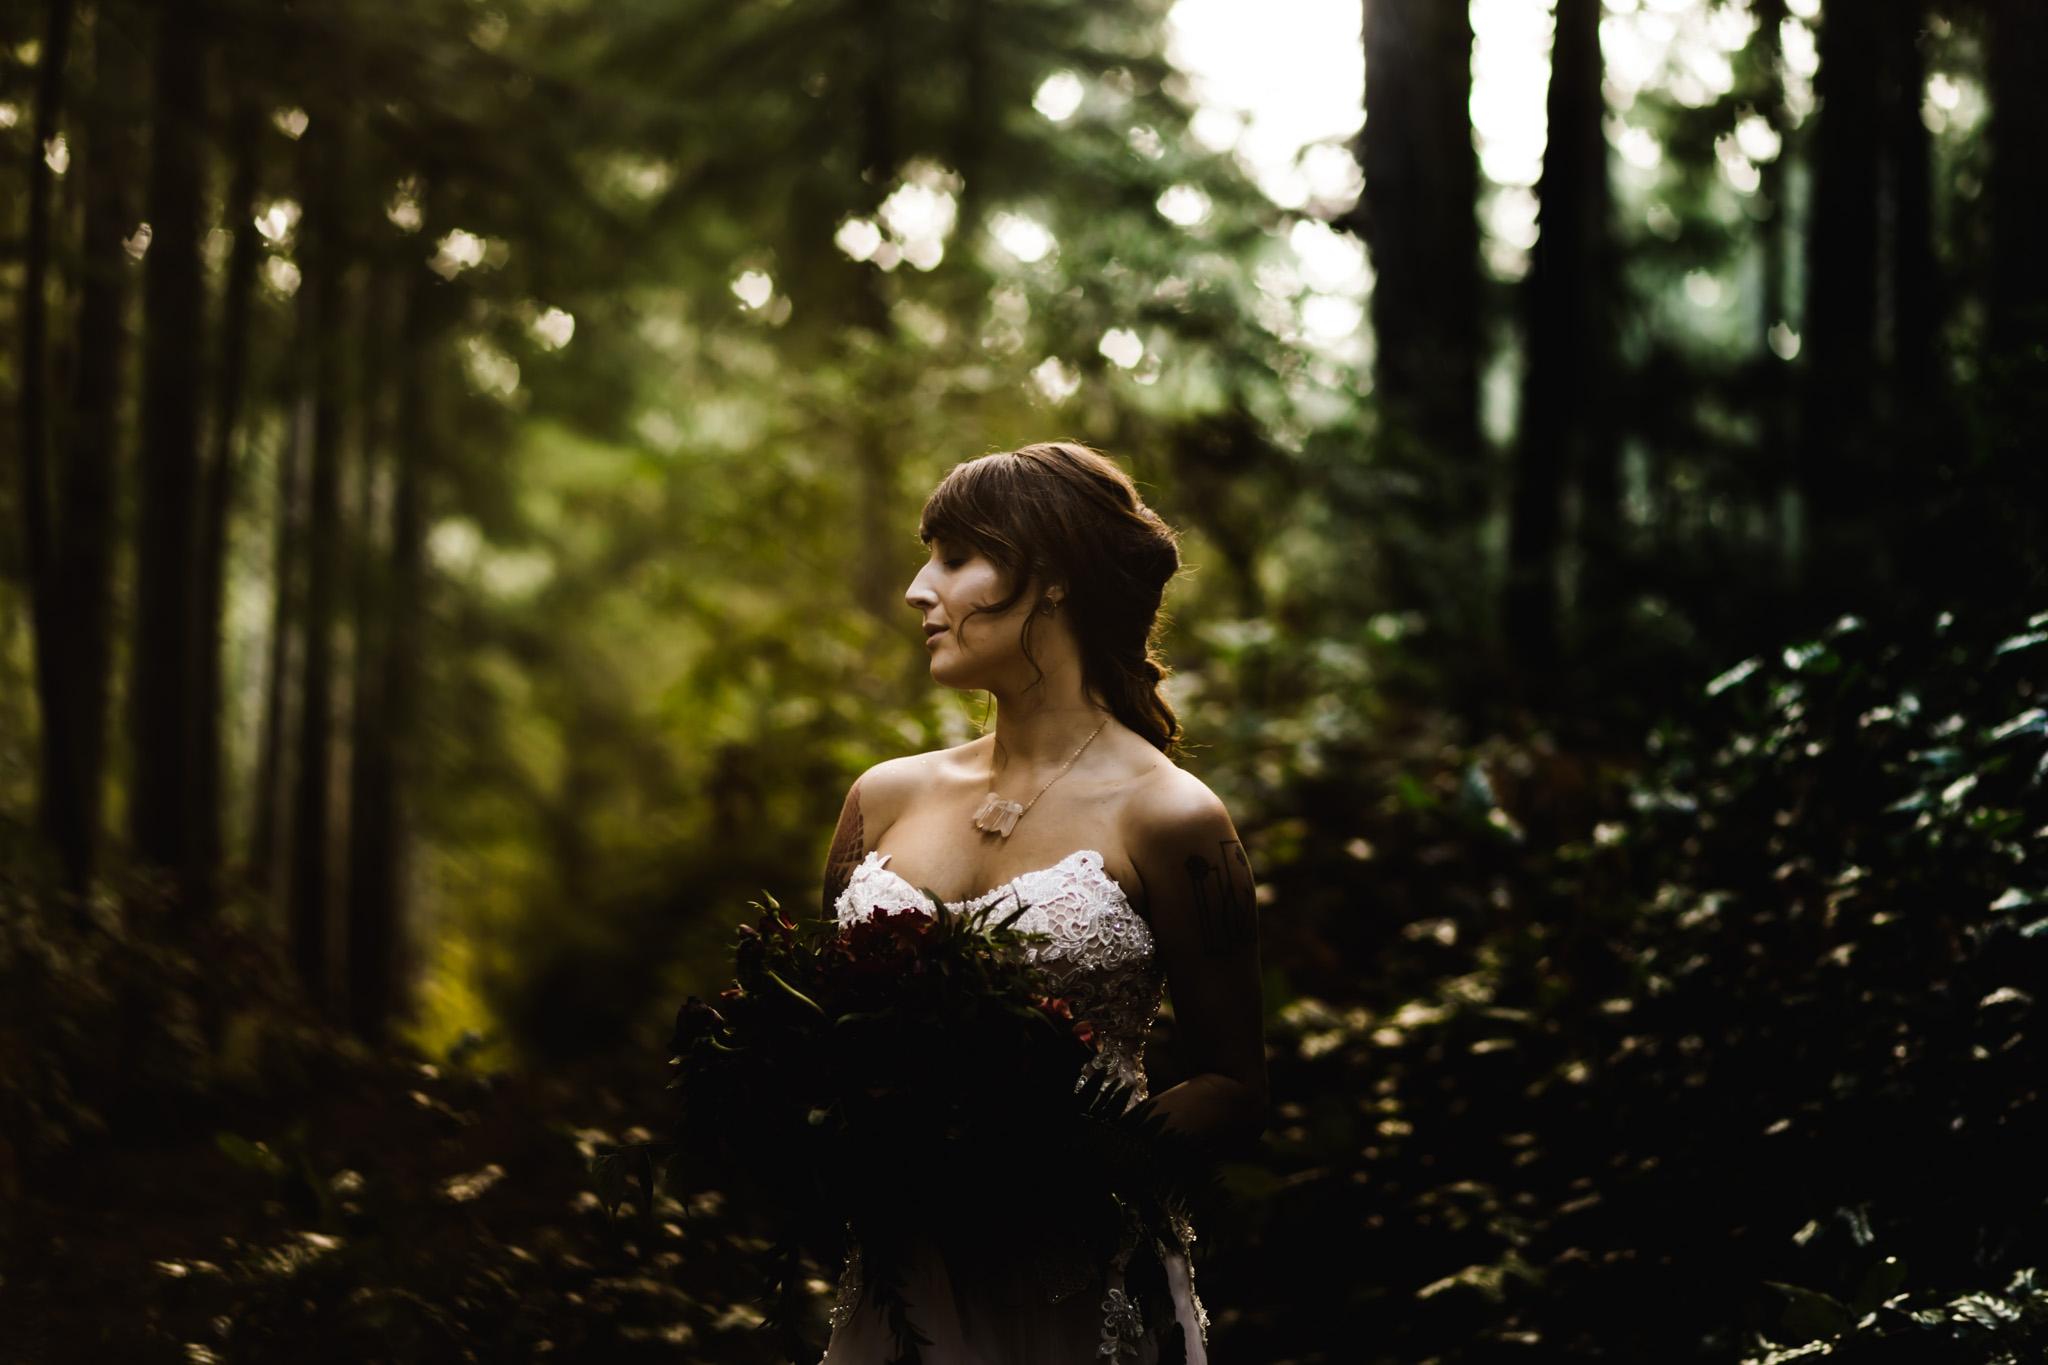 DannieMelissaWit_AbeillePhotography.com_BARE_Bridal_COLLABORATION-74.jpg